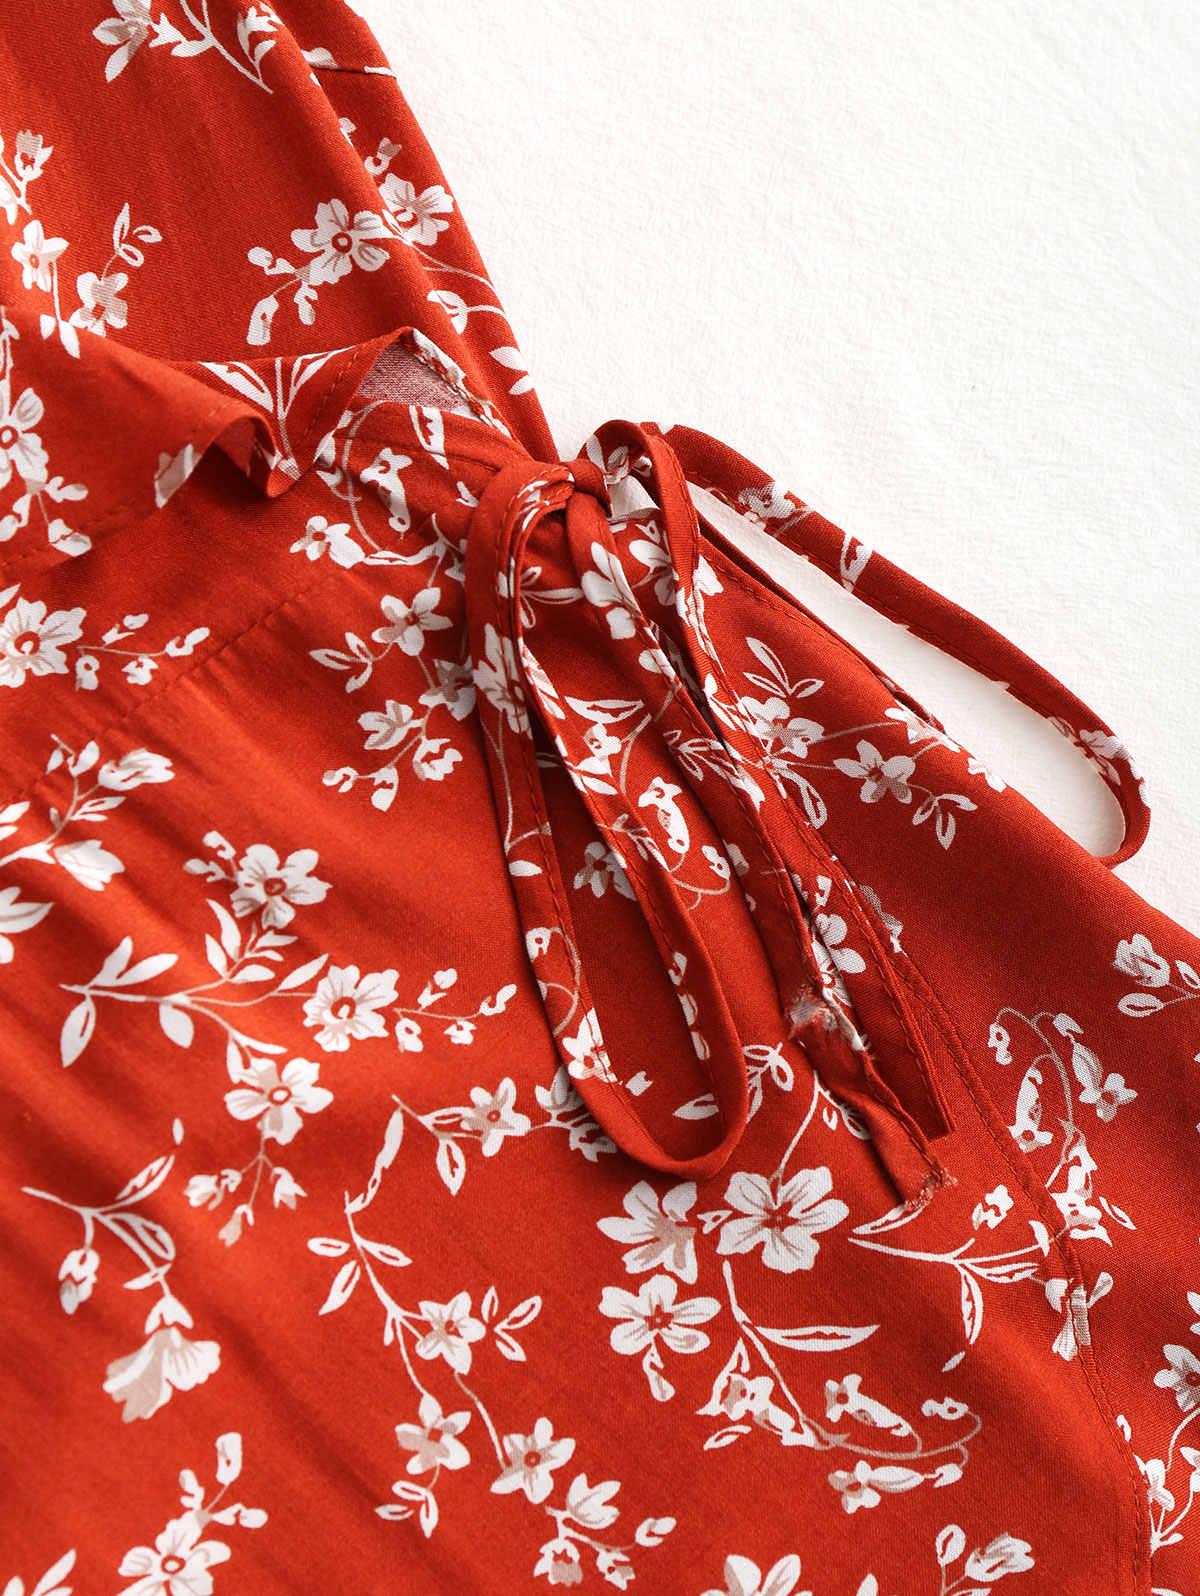 70603a31196a2 Wipalo Boho Summer Dress Tiny Floral Ruffle Wrap Mini Dress 2018 Women V  Neck Casual Short Sleeve Beach Dress Vestidos Robes